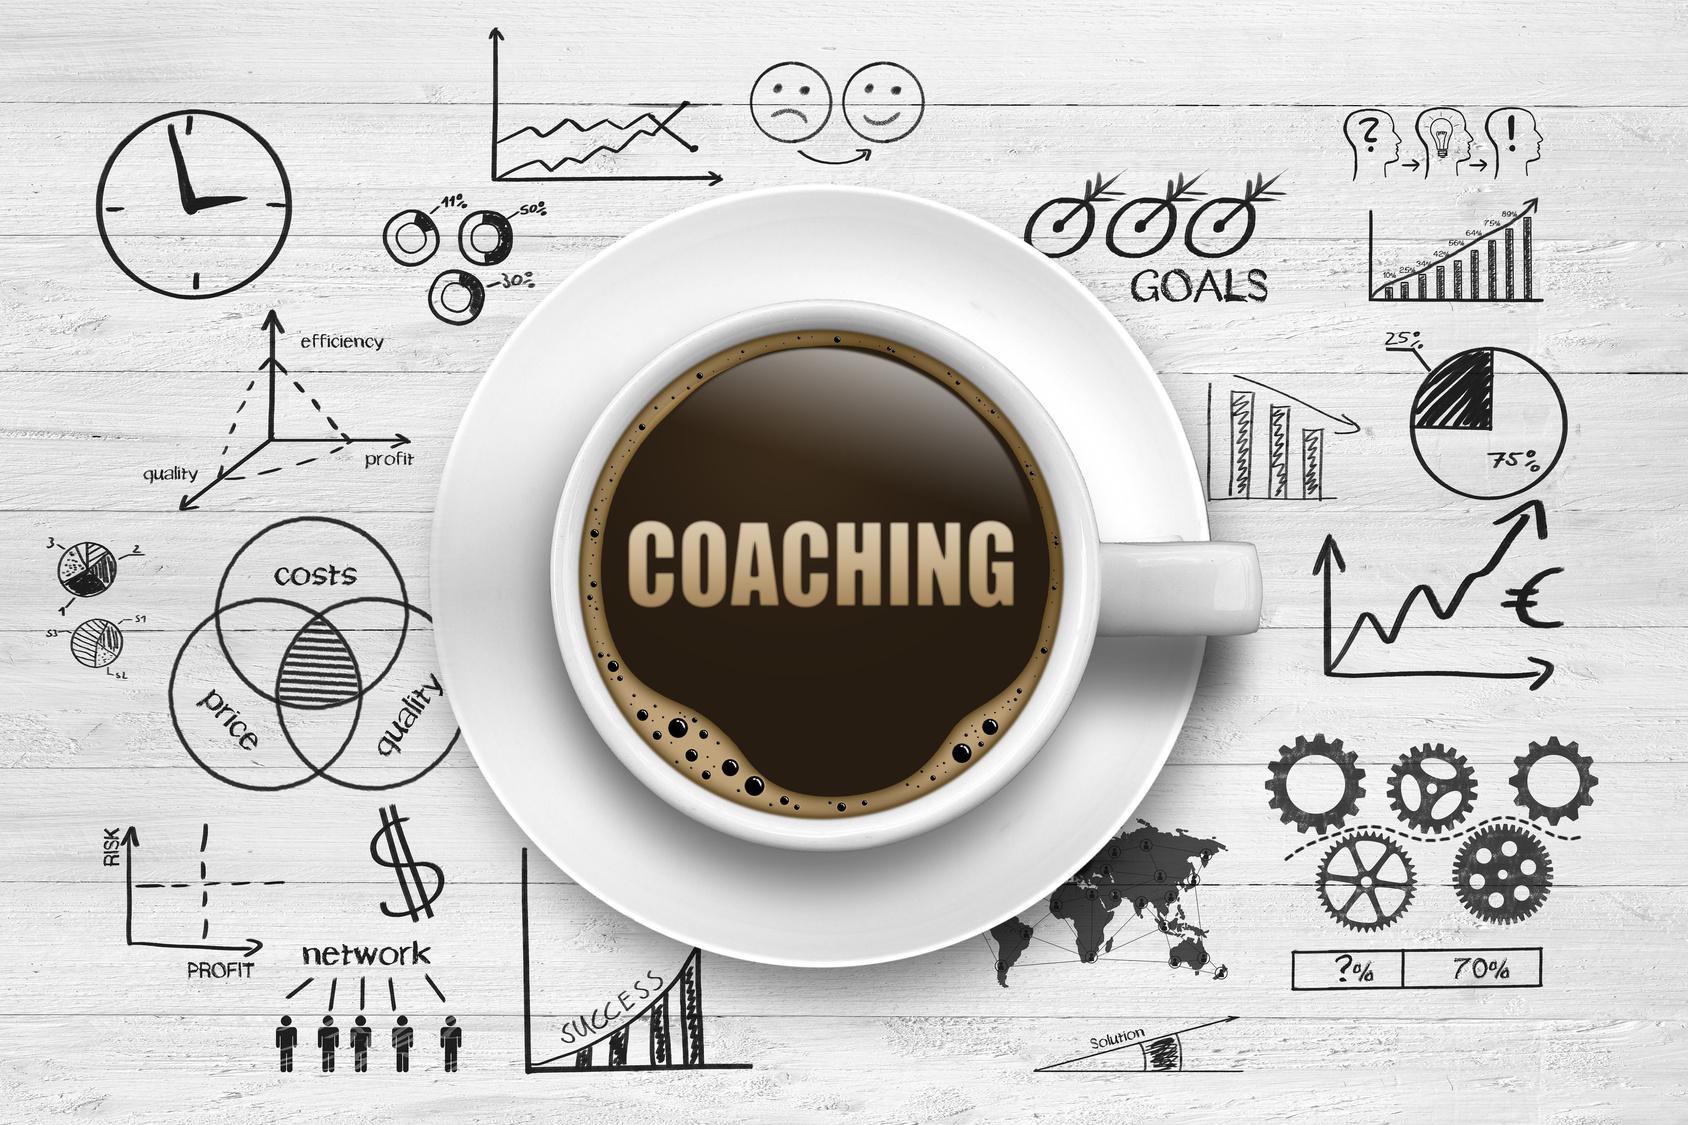 Coaching Emprendedor Empresarial - Envía una consulta para responderte en un máximo de 48 horas